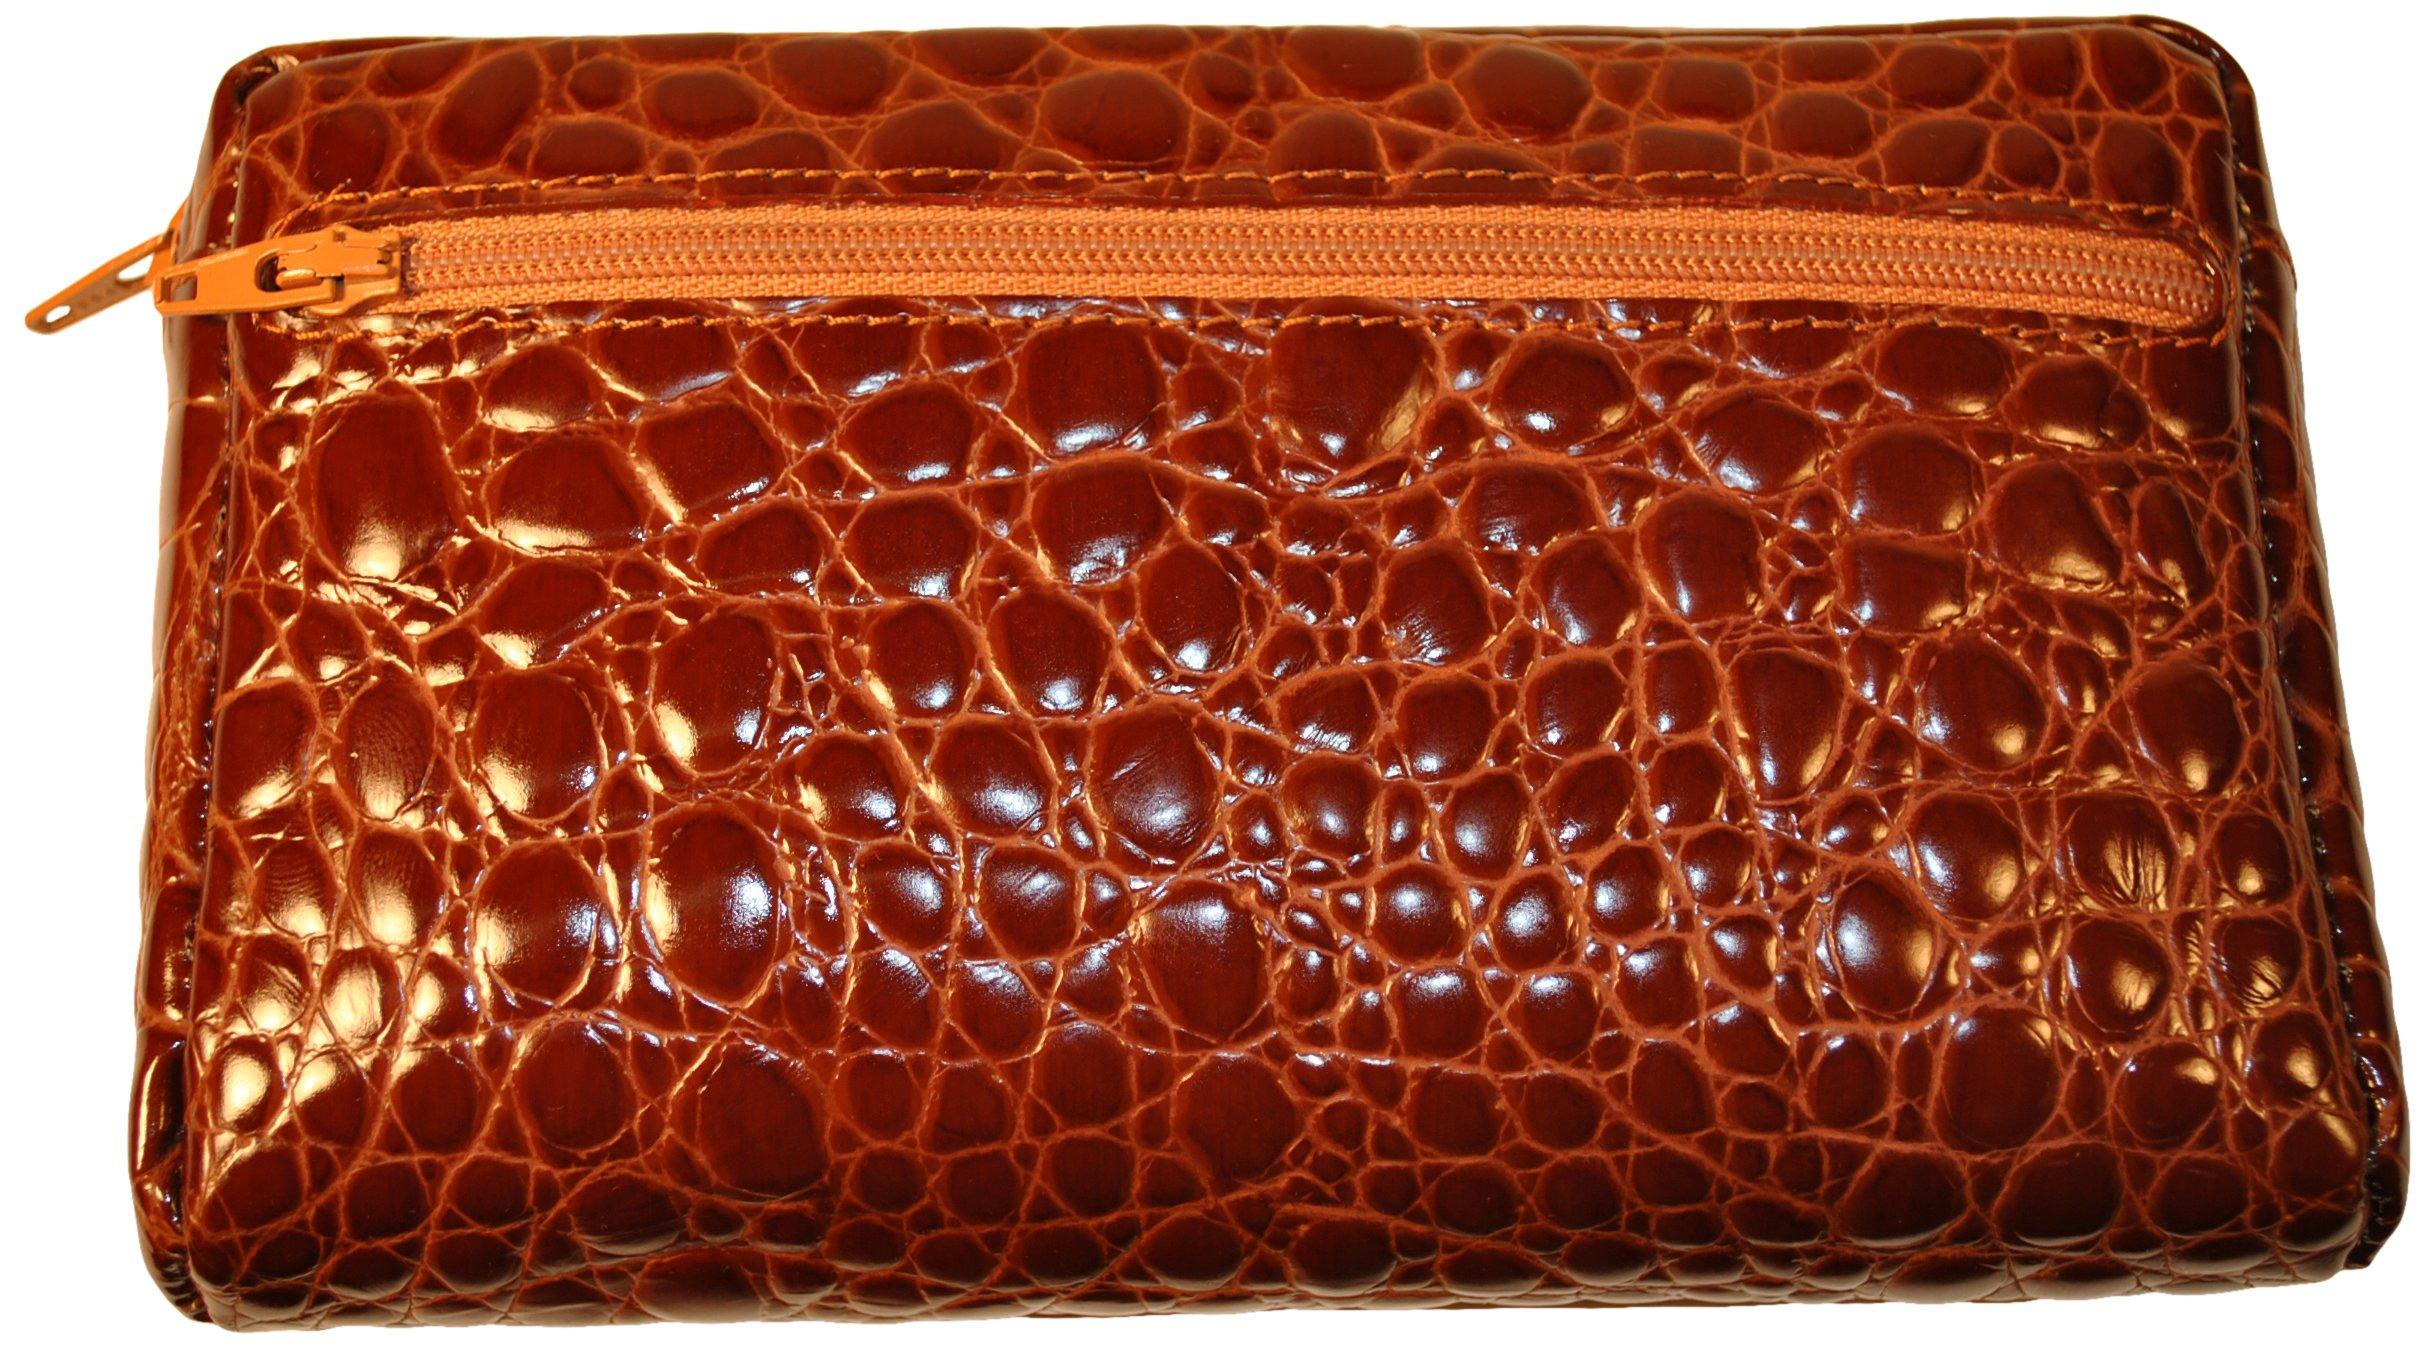 Budd Leather Croco Bidente Cosmetic Case, Cognac